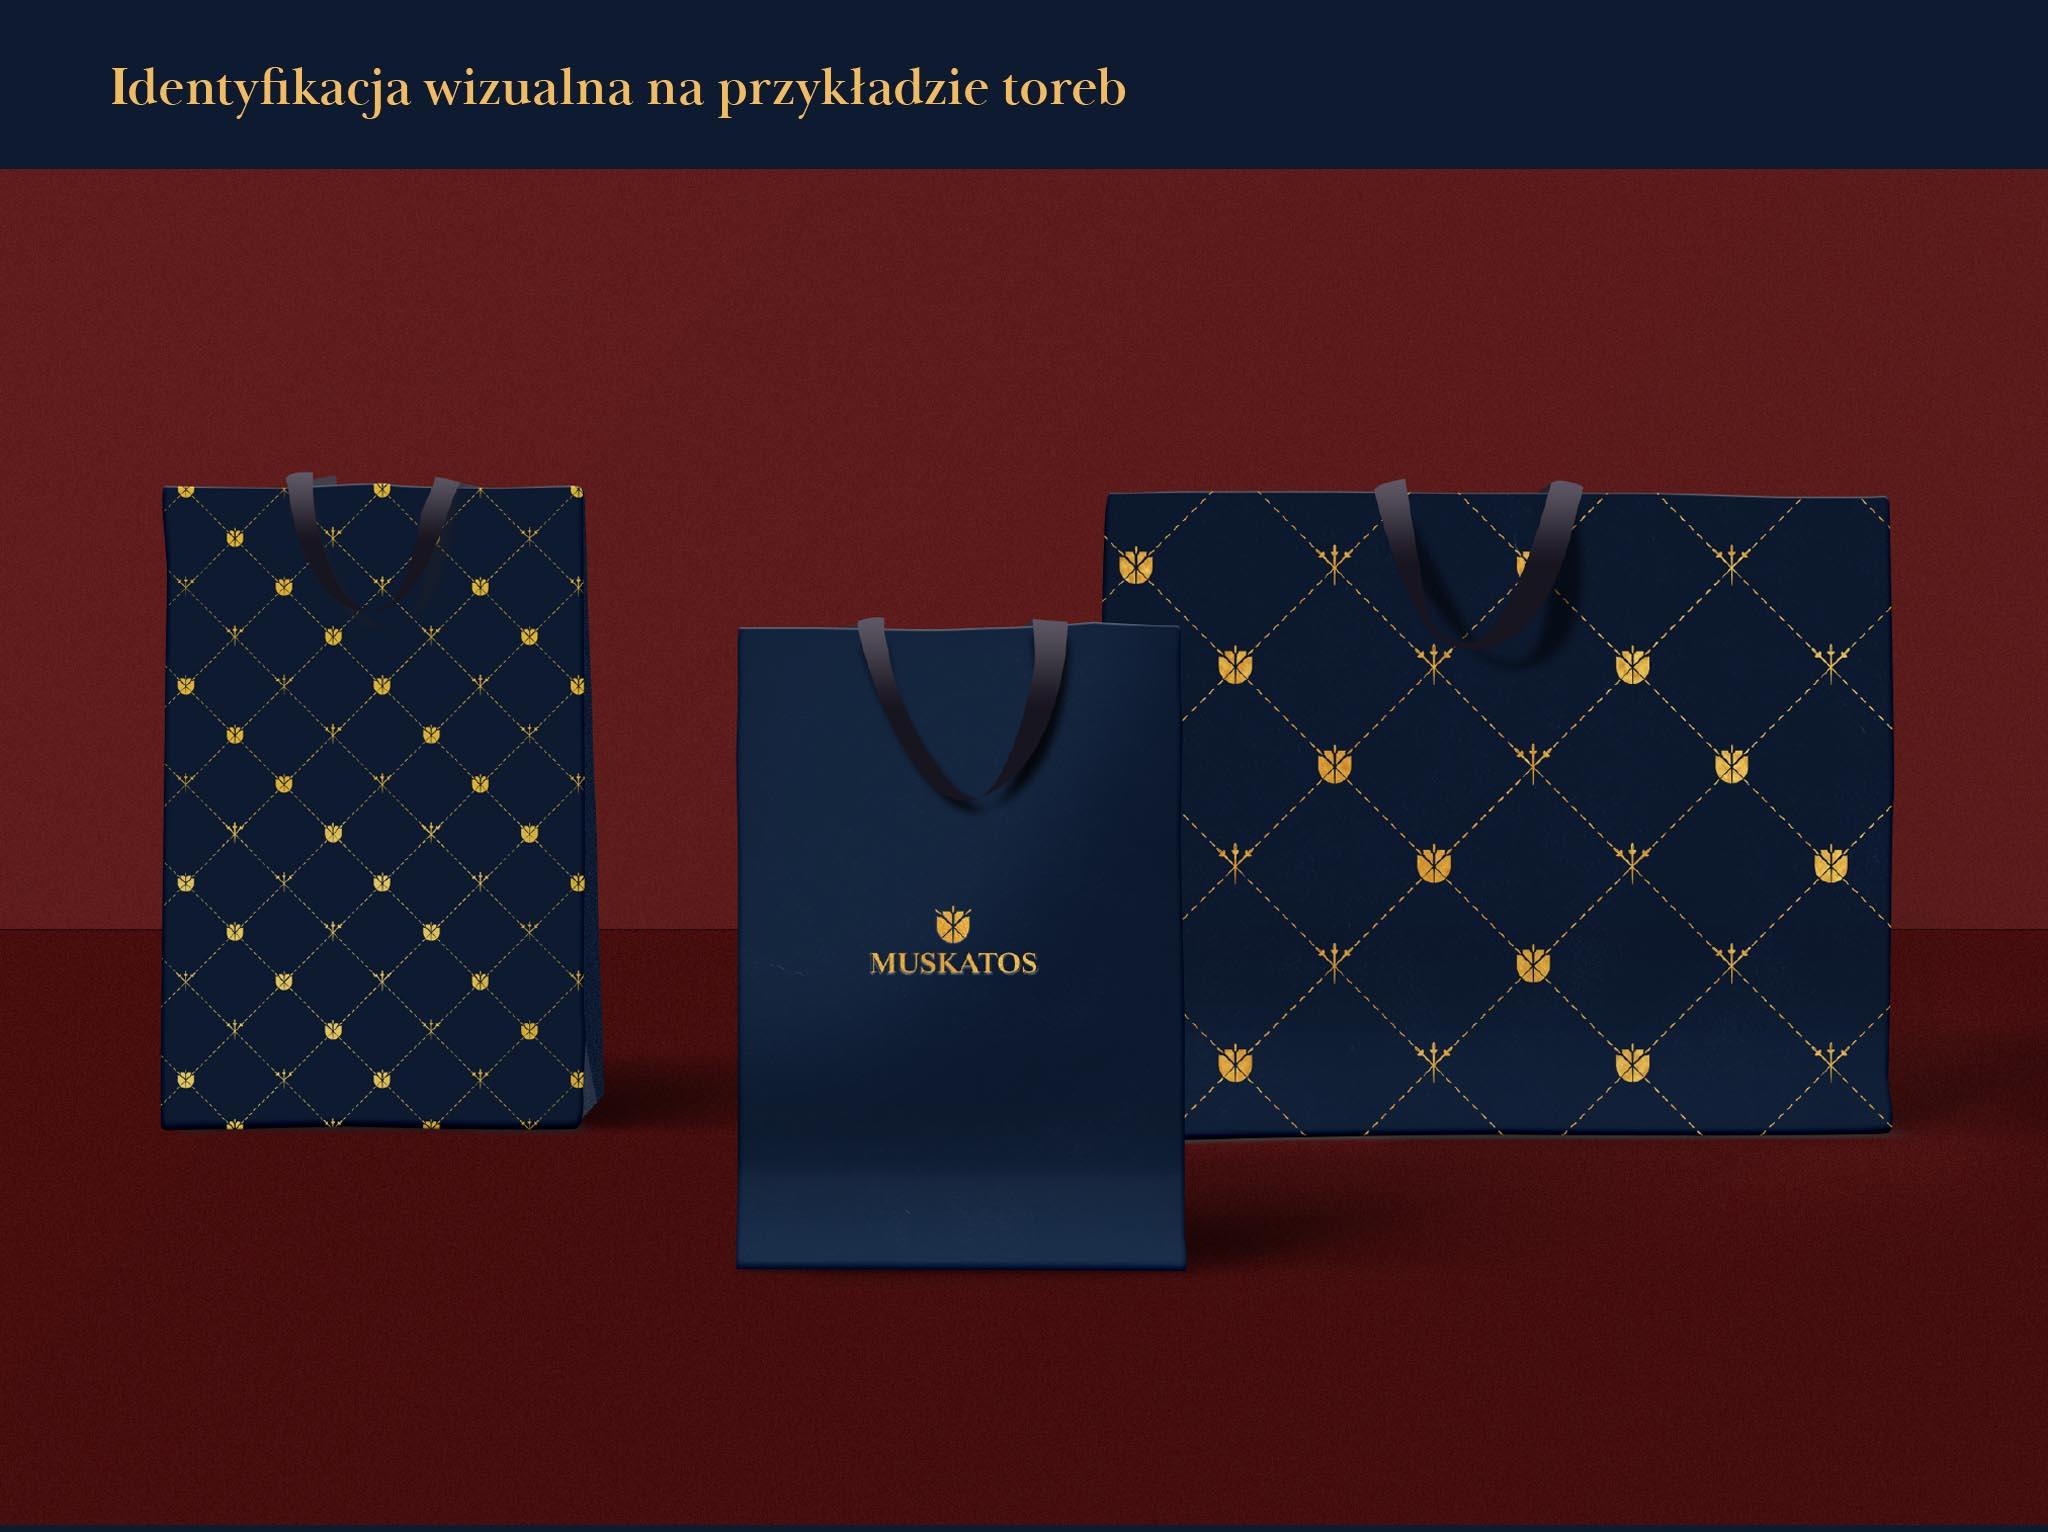 identyfikacja_wizualna_muskatos_projekt_pudelka_agencja